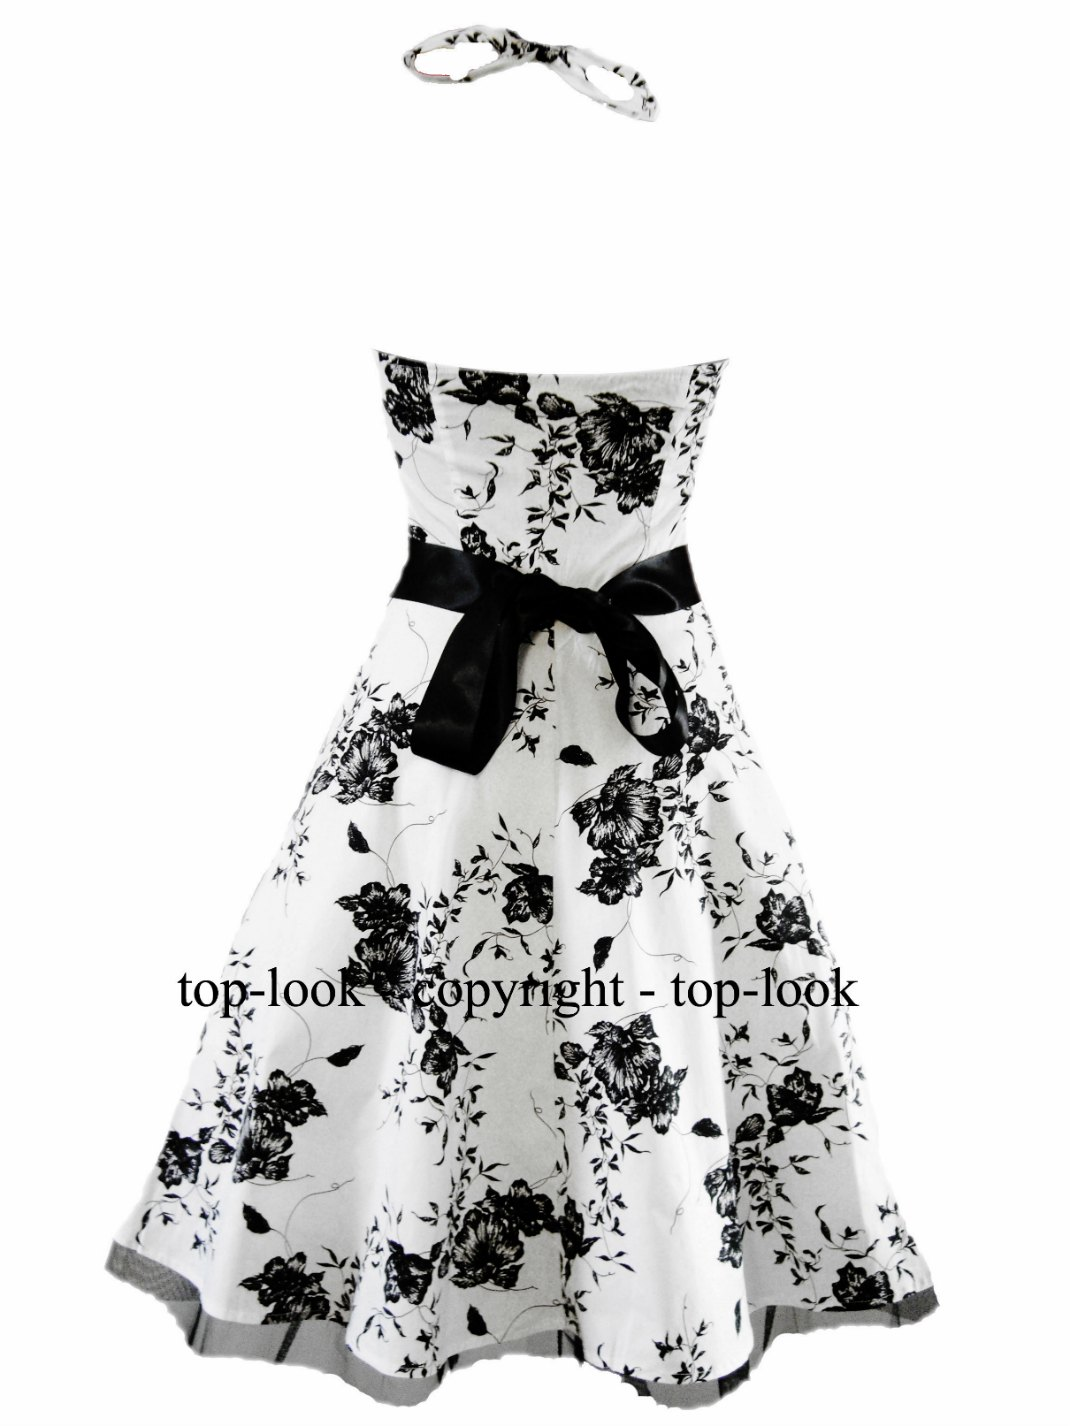 Linda Blue Vintage 50s Midi Floral Swing Dress 1950s Prom Dresses